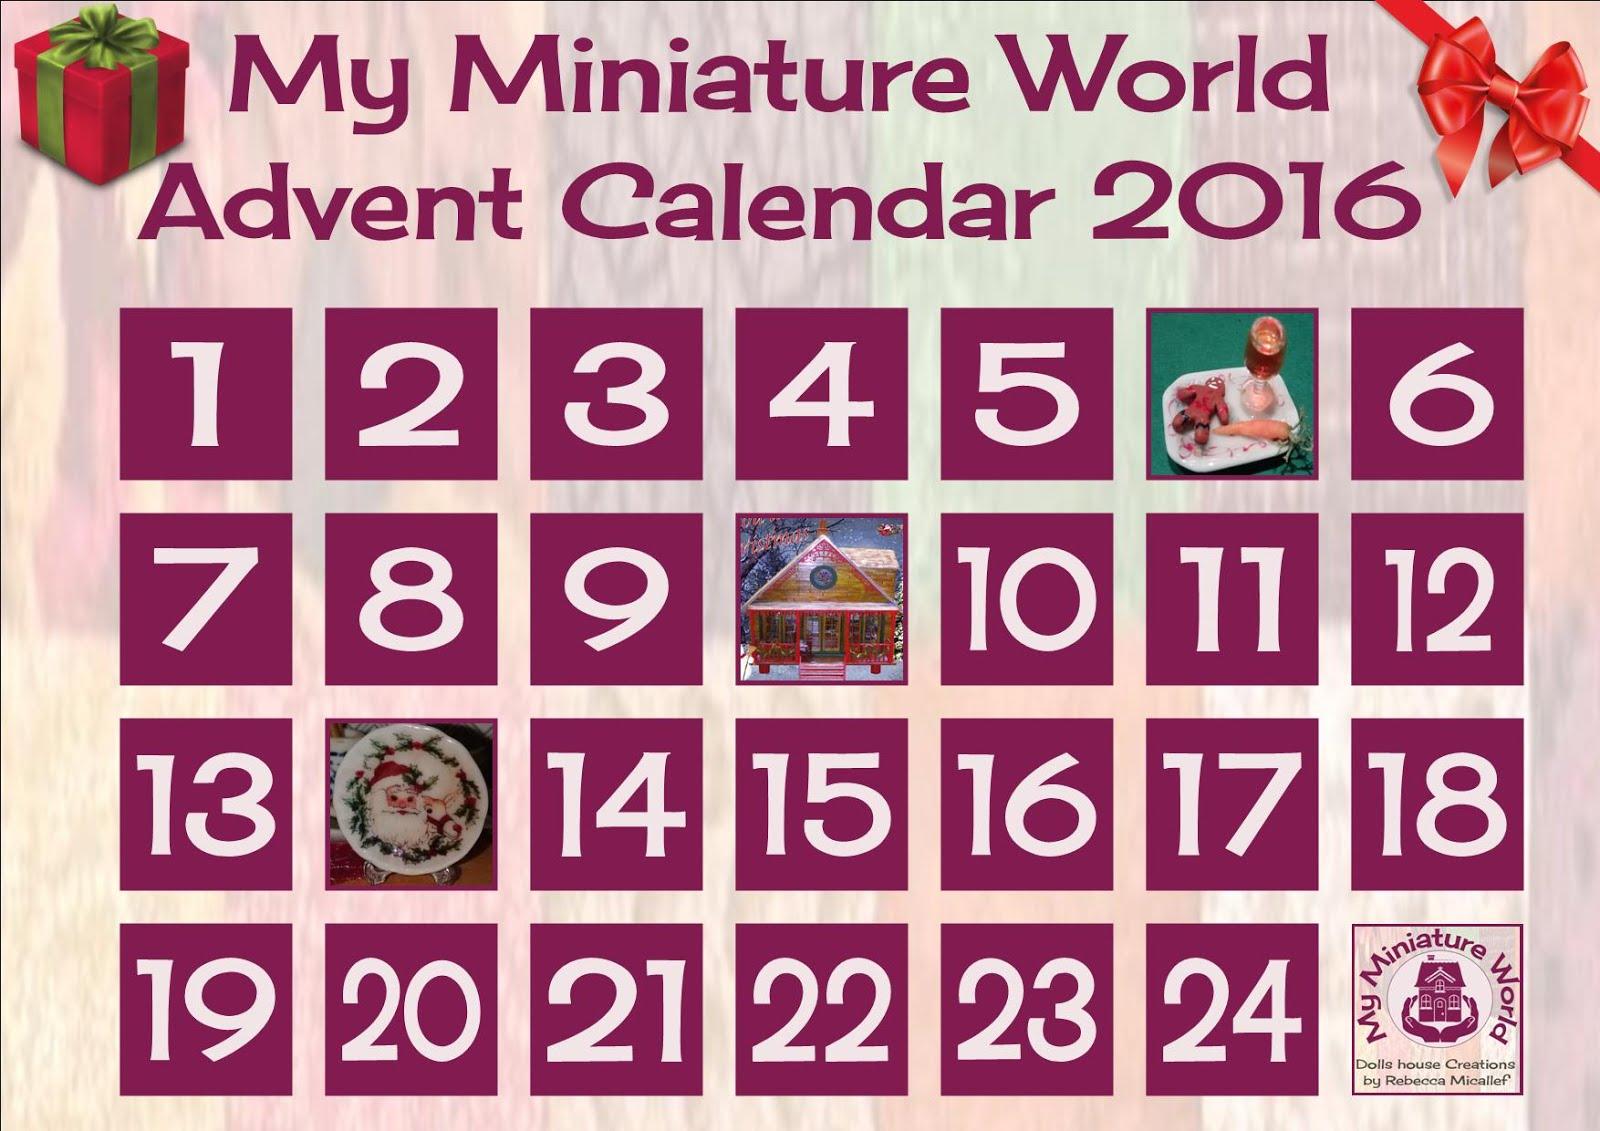 CALENDARIO DE ADVIENTO DE MY MINIATURE WORLD